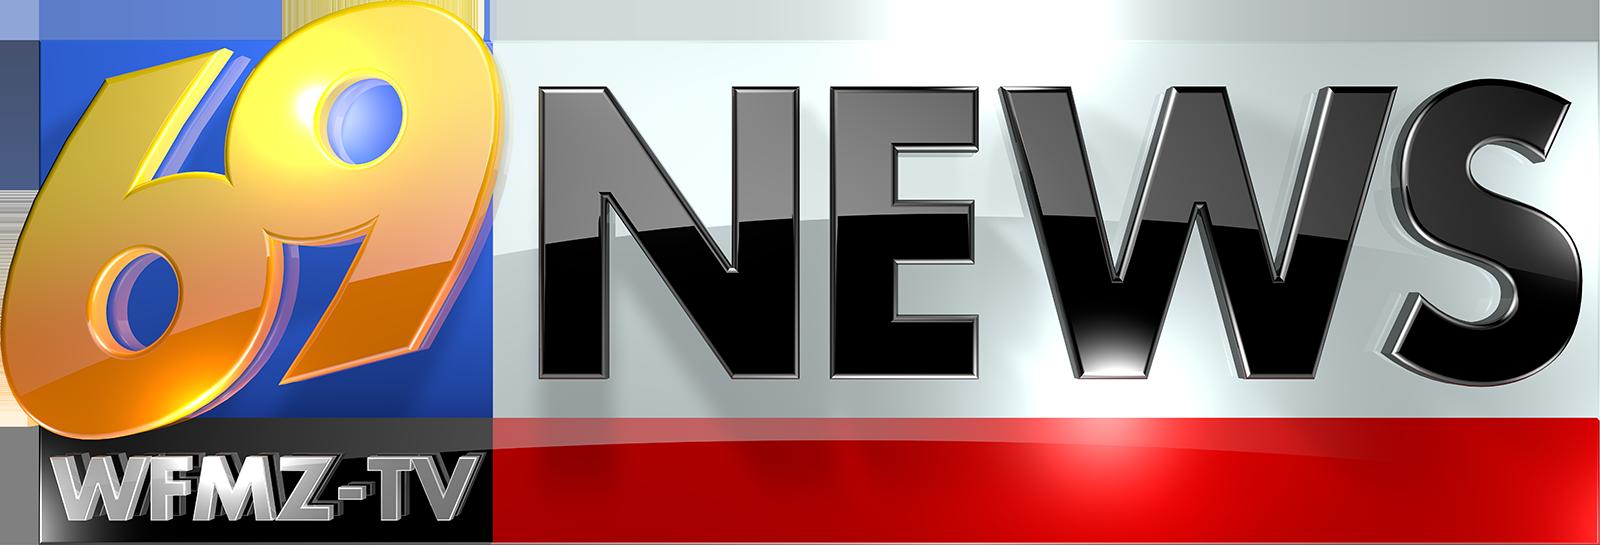 WFMZ 69 News Logo